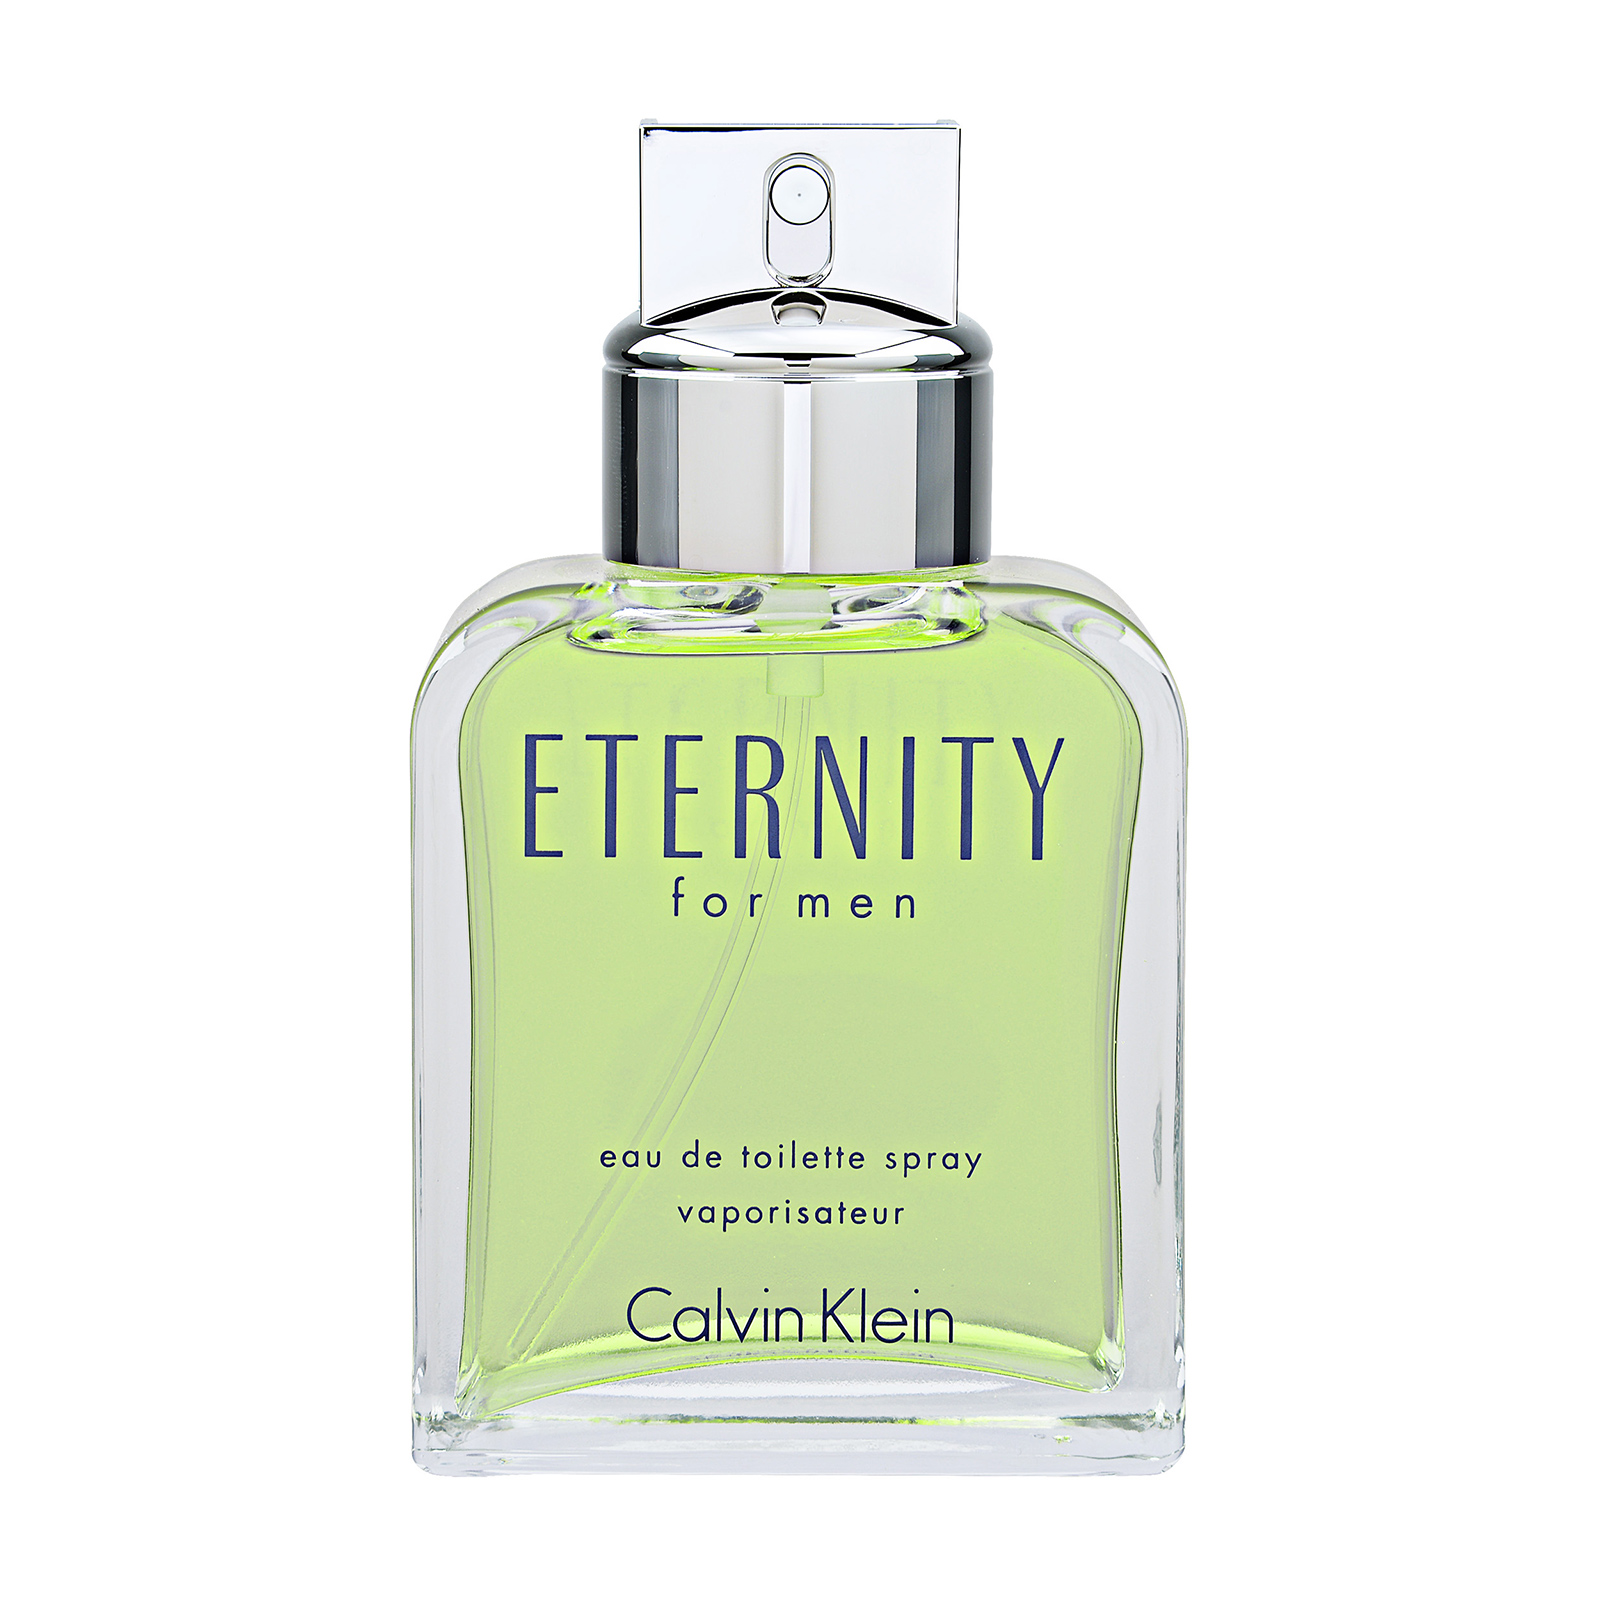 Calvin Klein Eternity For Men EDT Spray 3.4oz, 100ml